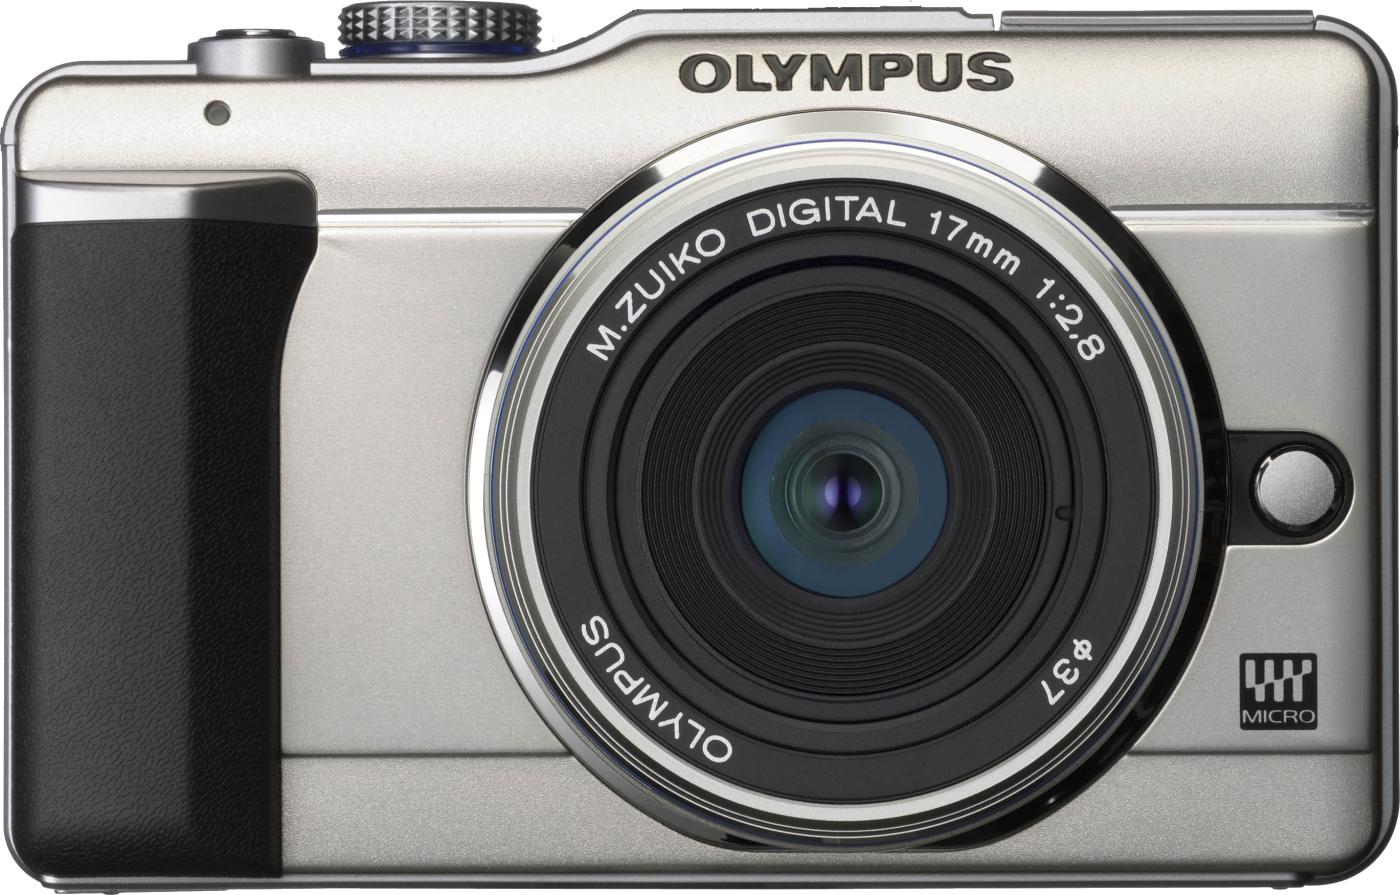 Olympus PEN E-PL1 + Olympus 14-42mm f3.5-5.6 L ED M.Zuiko Digital Zoom